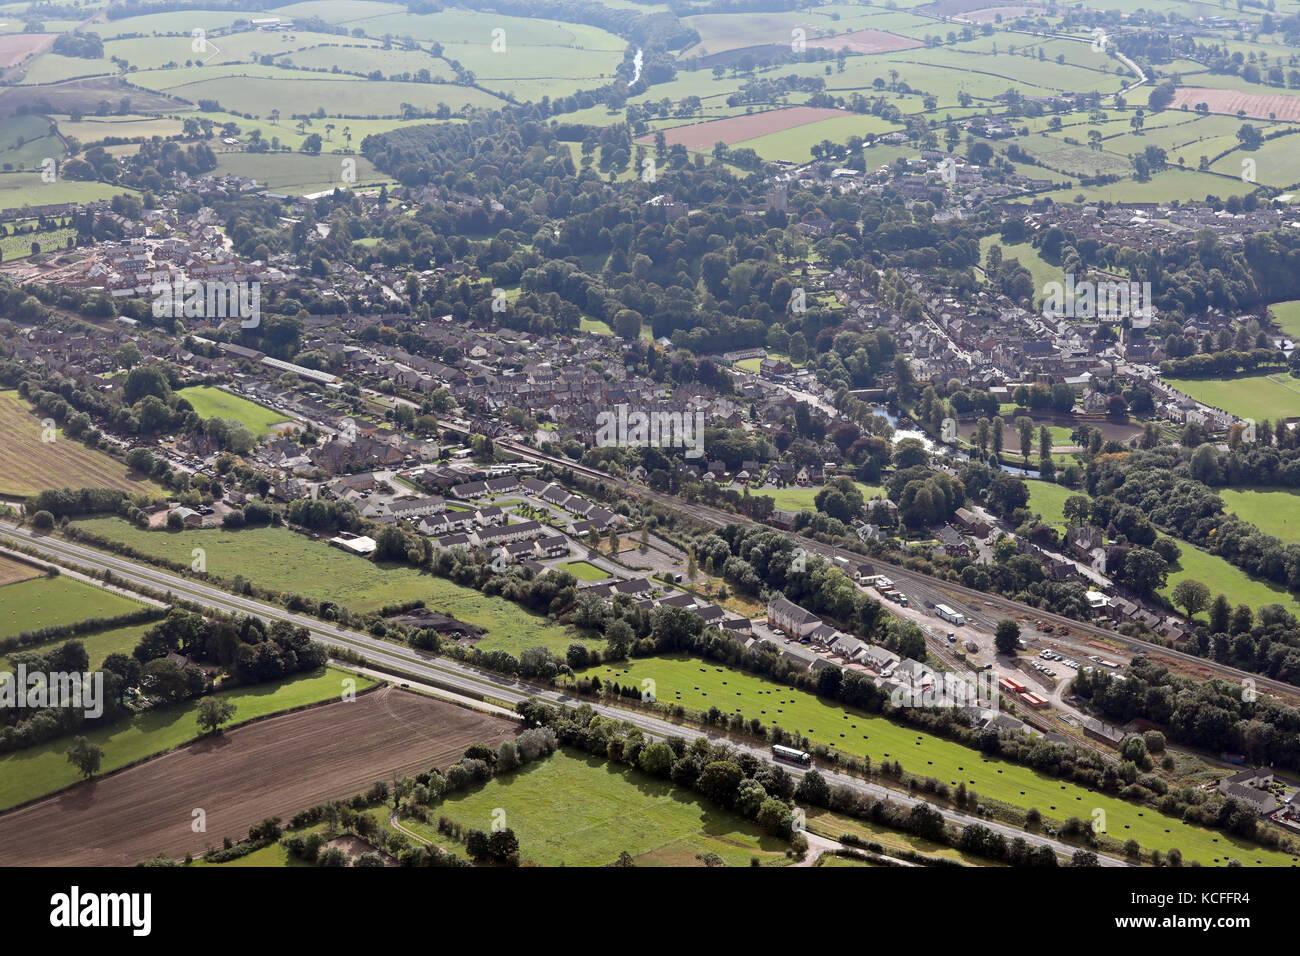 aerial view of Appleby, Cumbria, UK - Stock Image